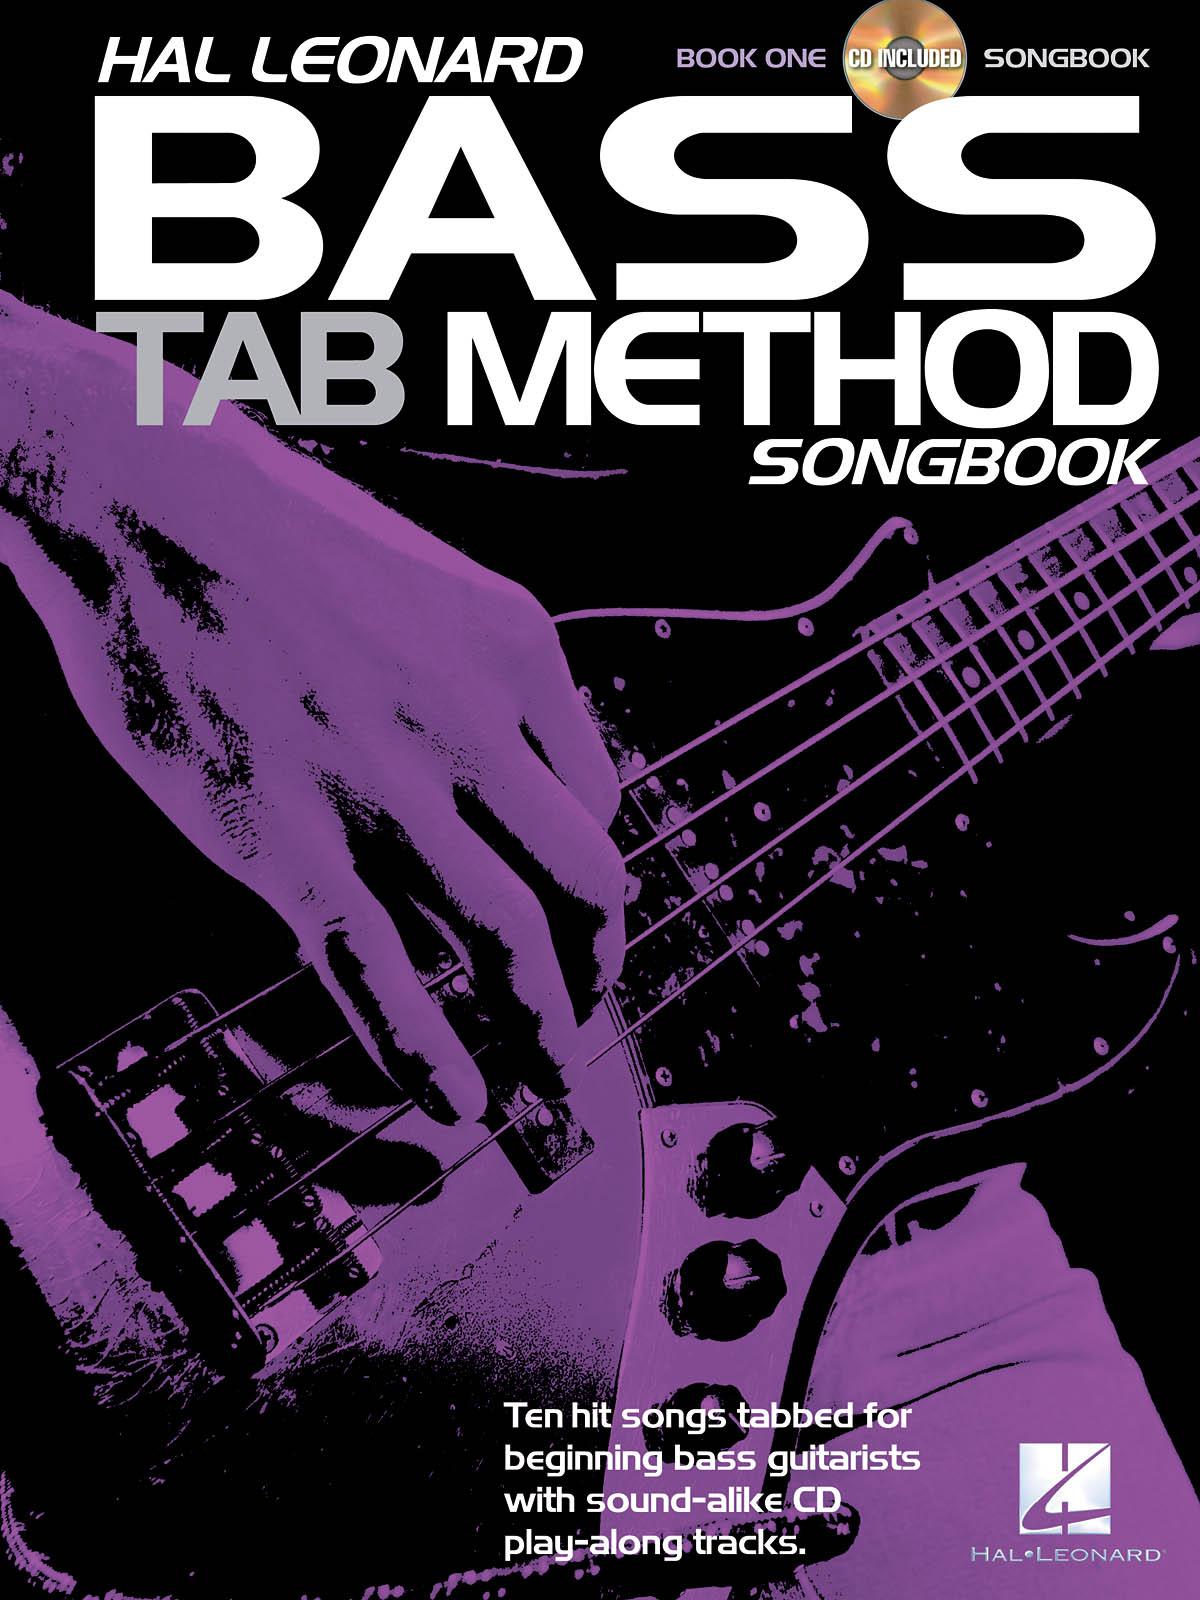 Hal Leonard Bass TAB Method Songbook 1: Bass Guitar Solo: Mixed Songbook